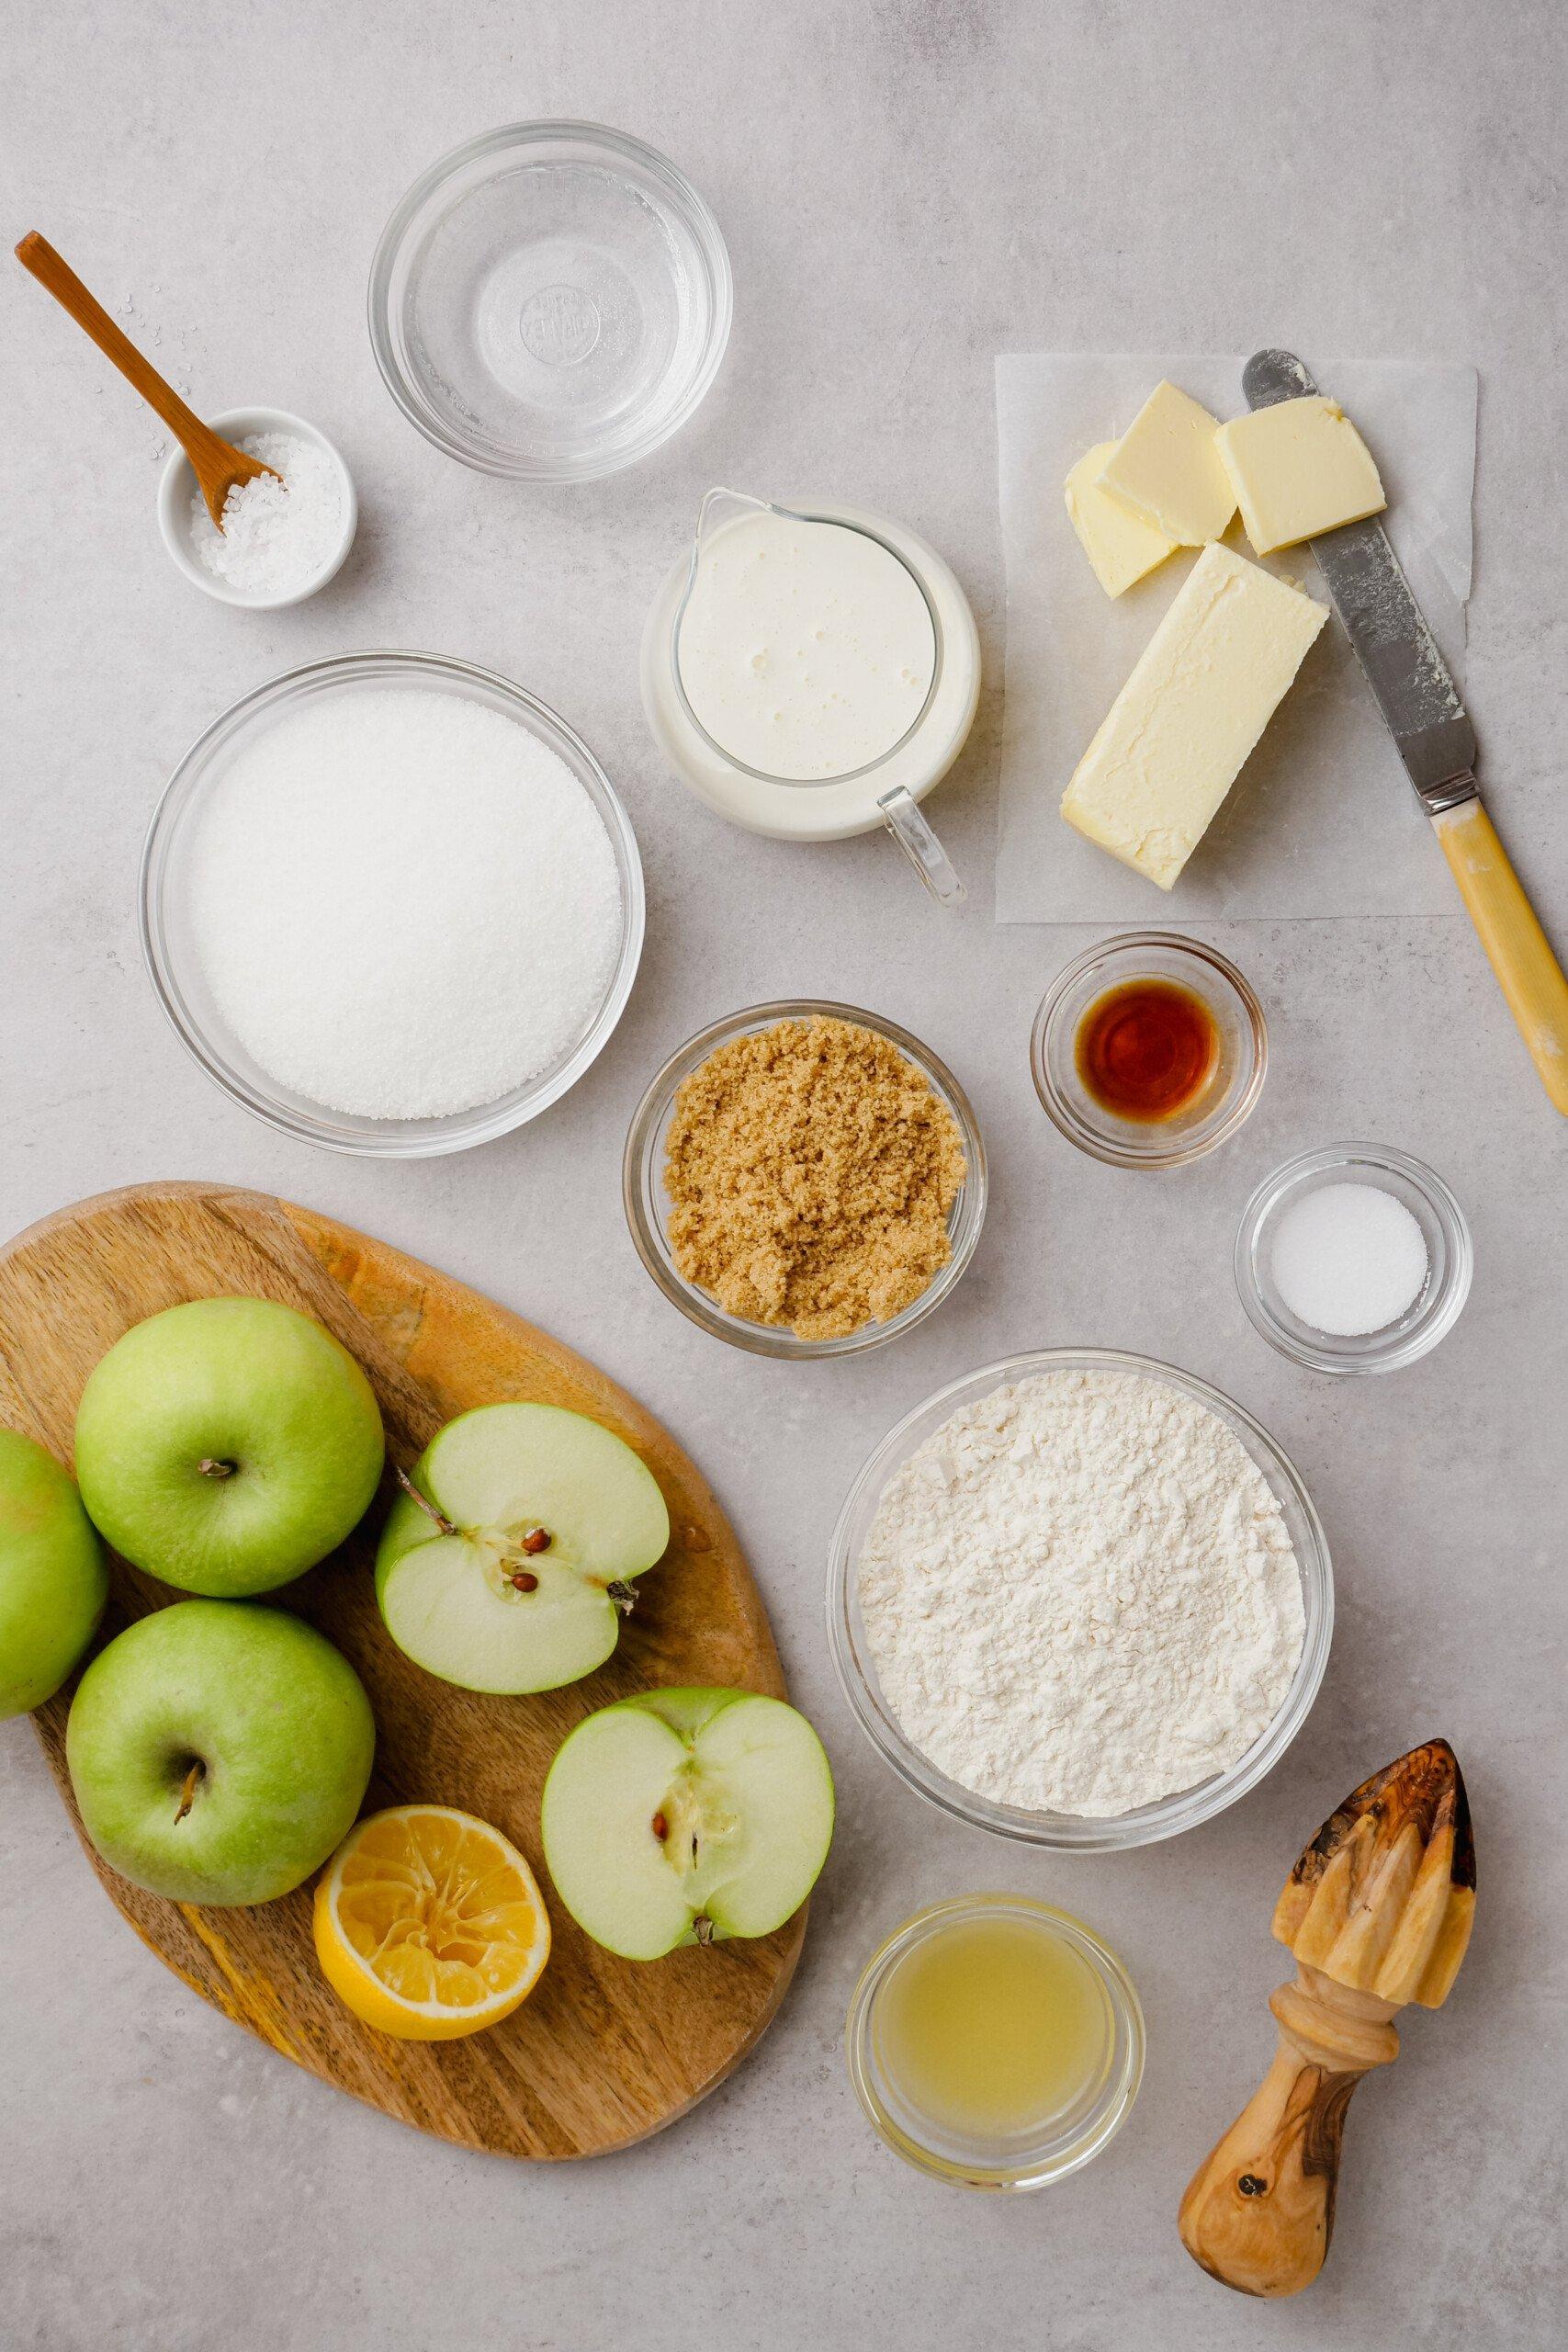 top down view of ingredients in bowls